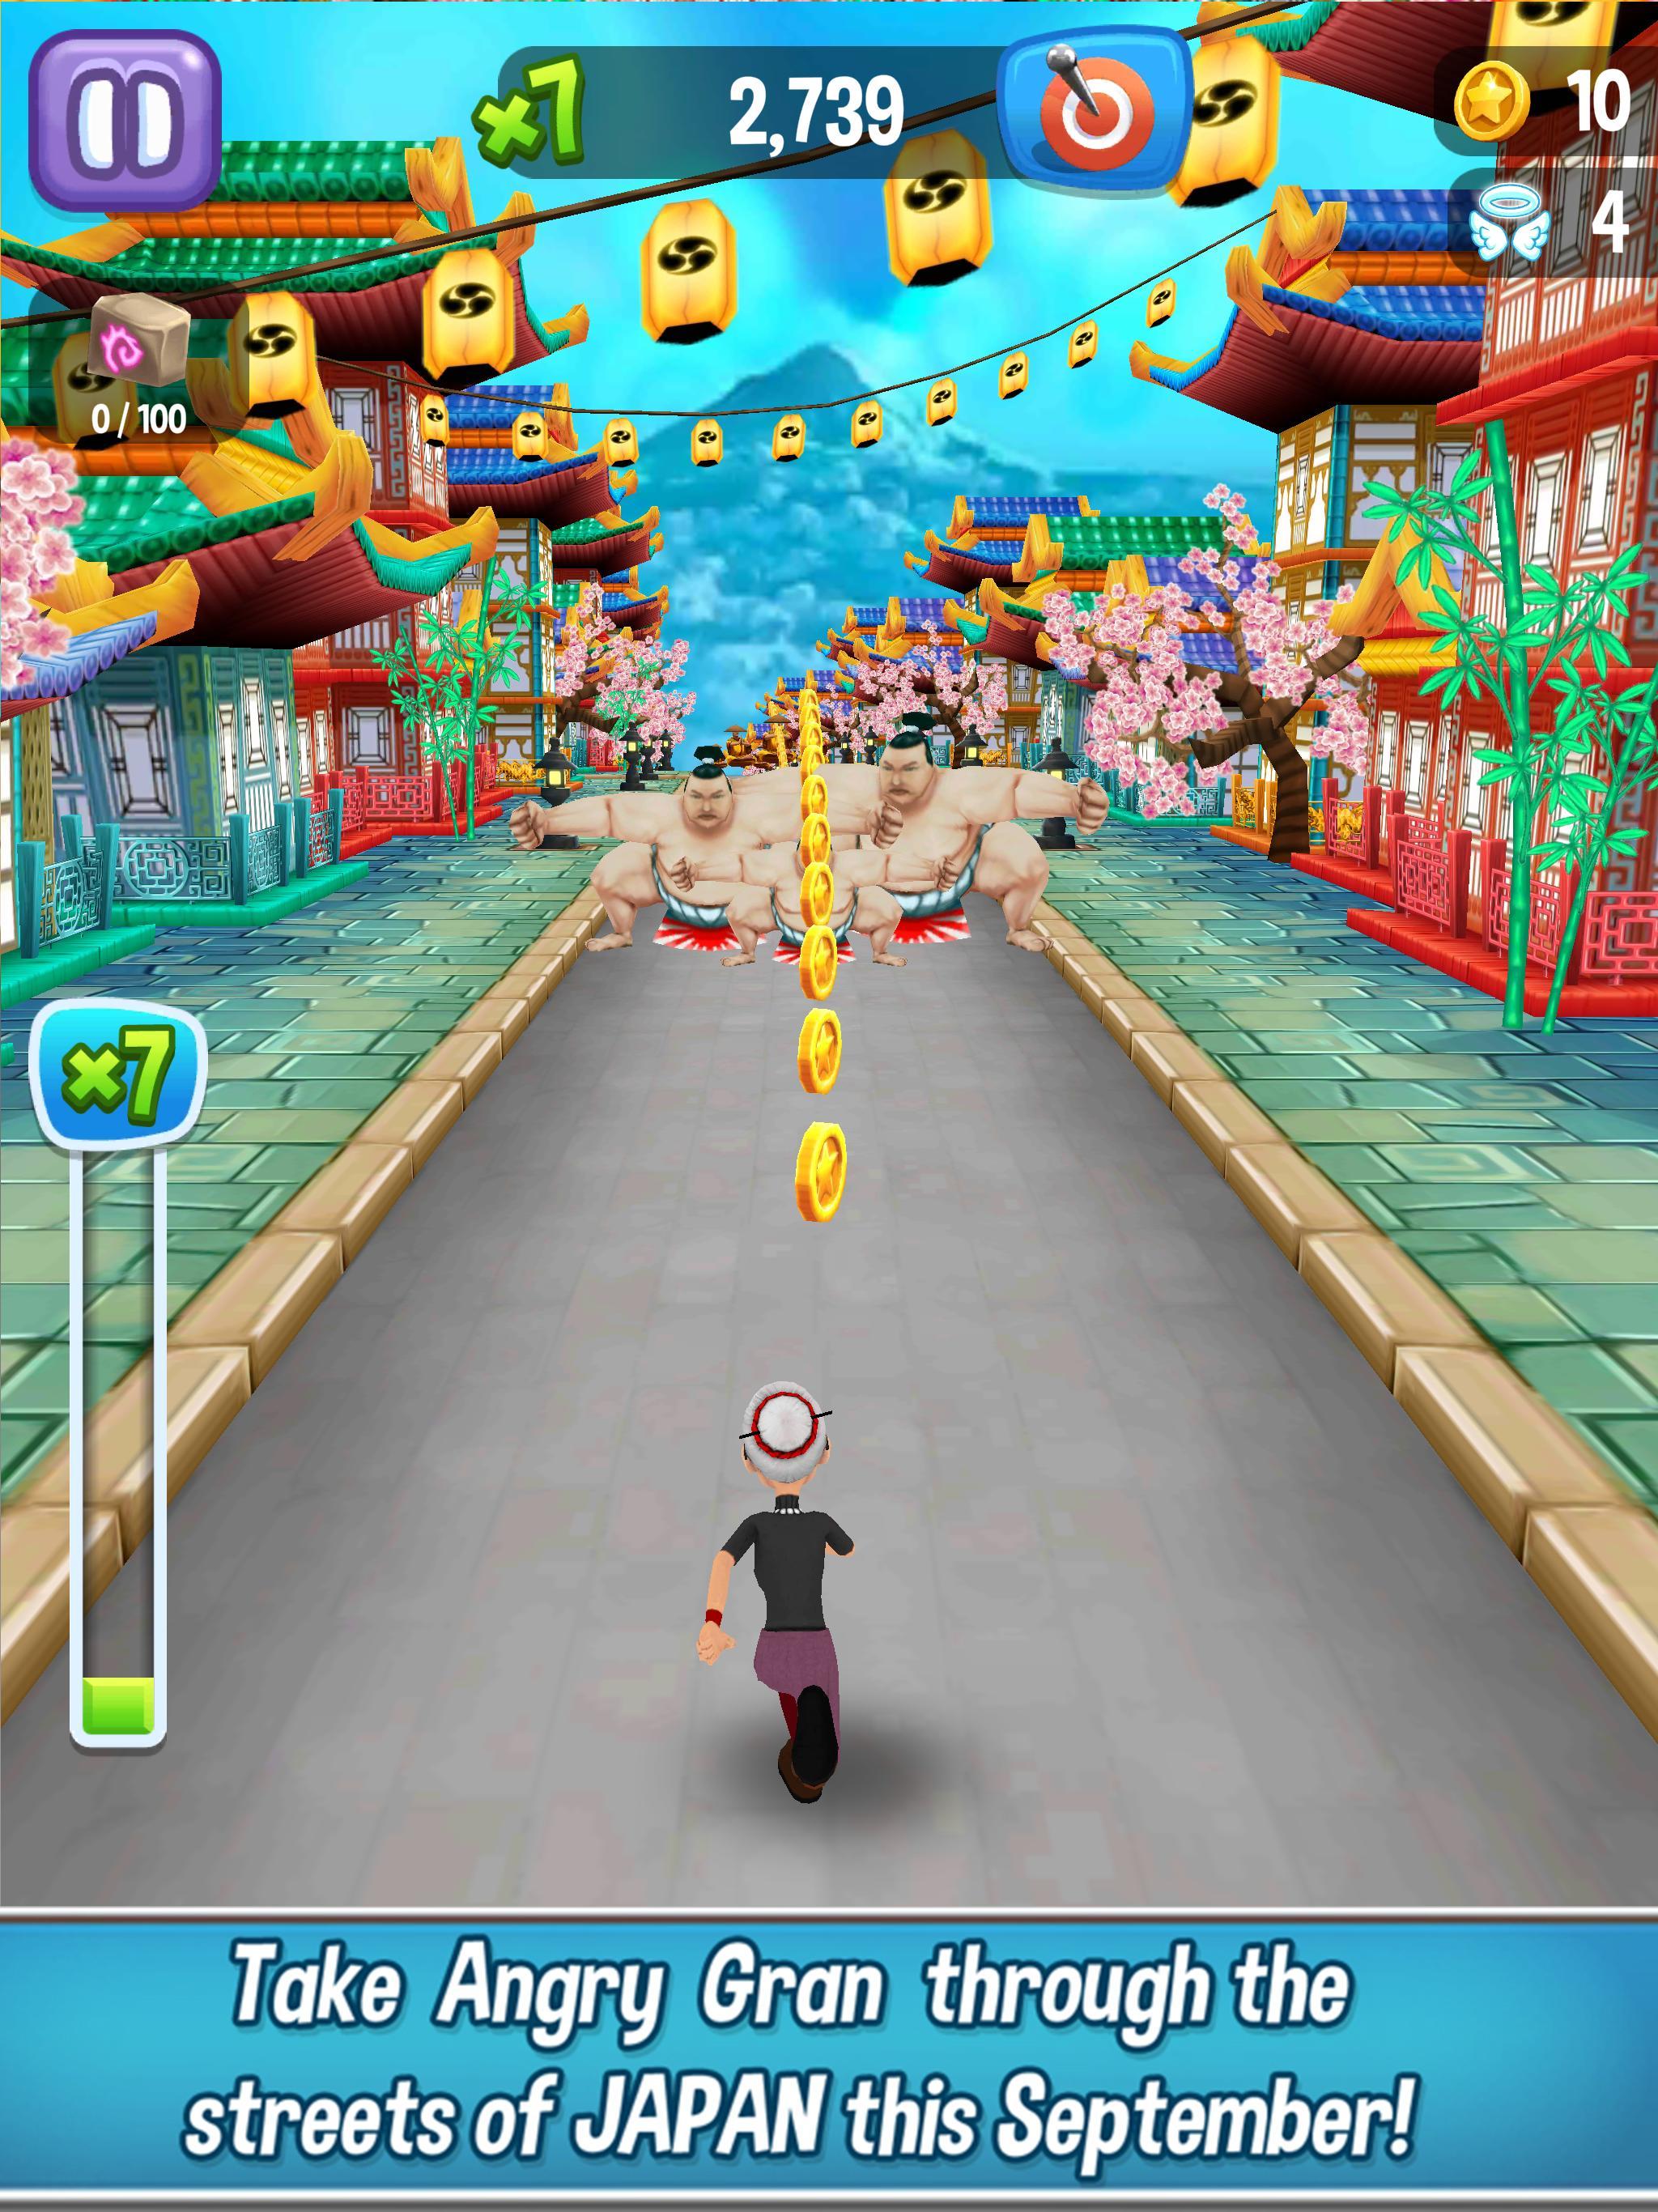 Angry Gran Run Running Game 2.12.1 Screenshot 7